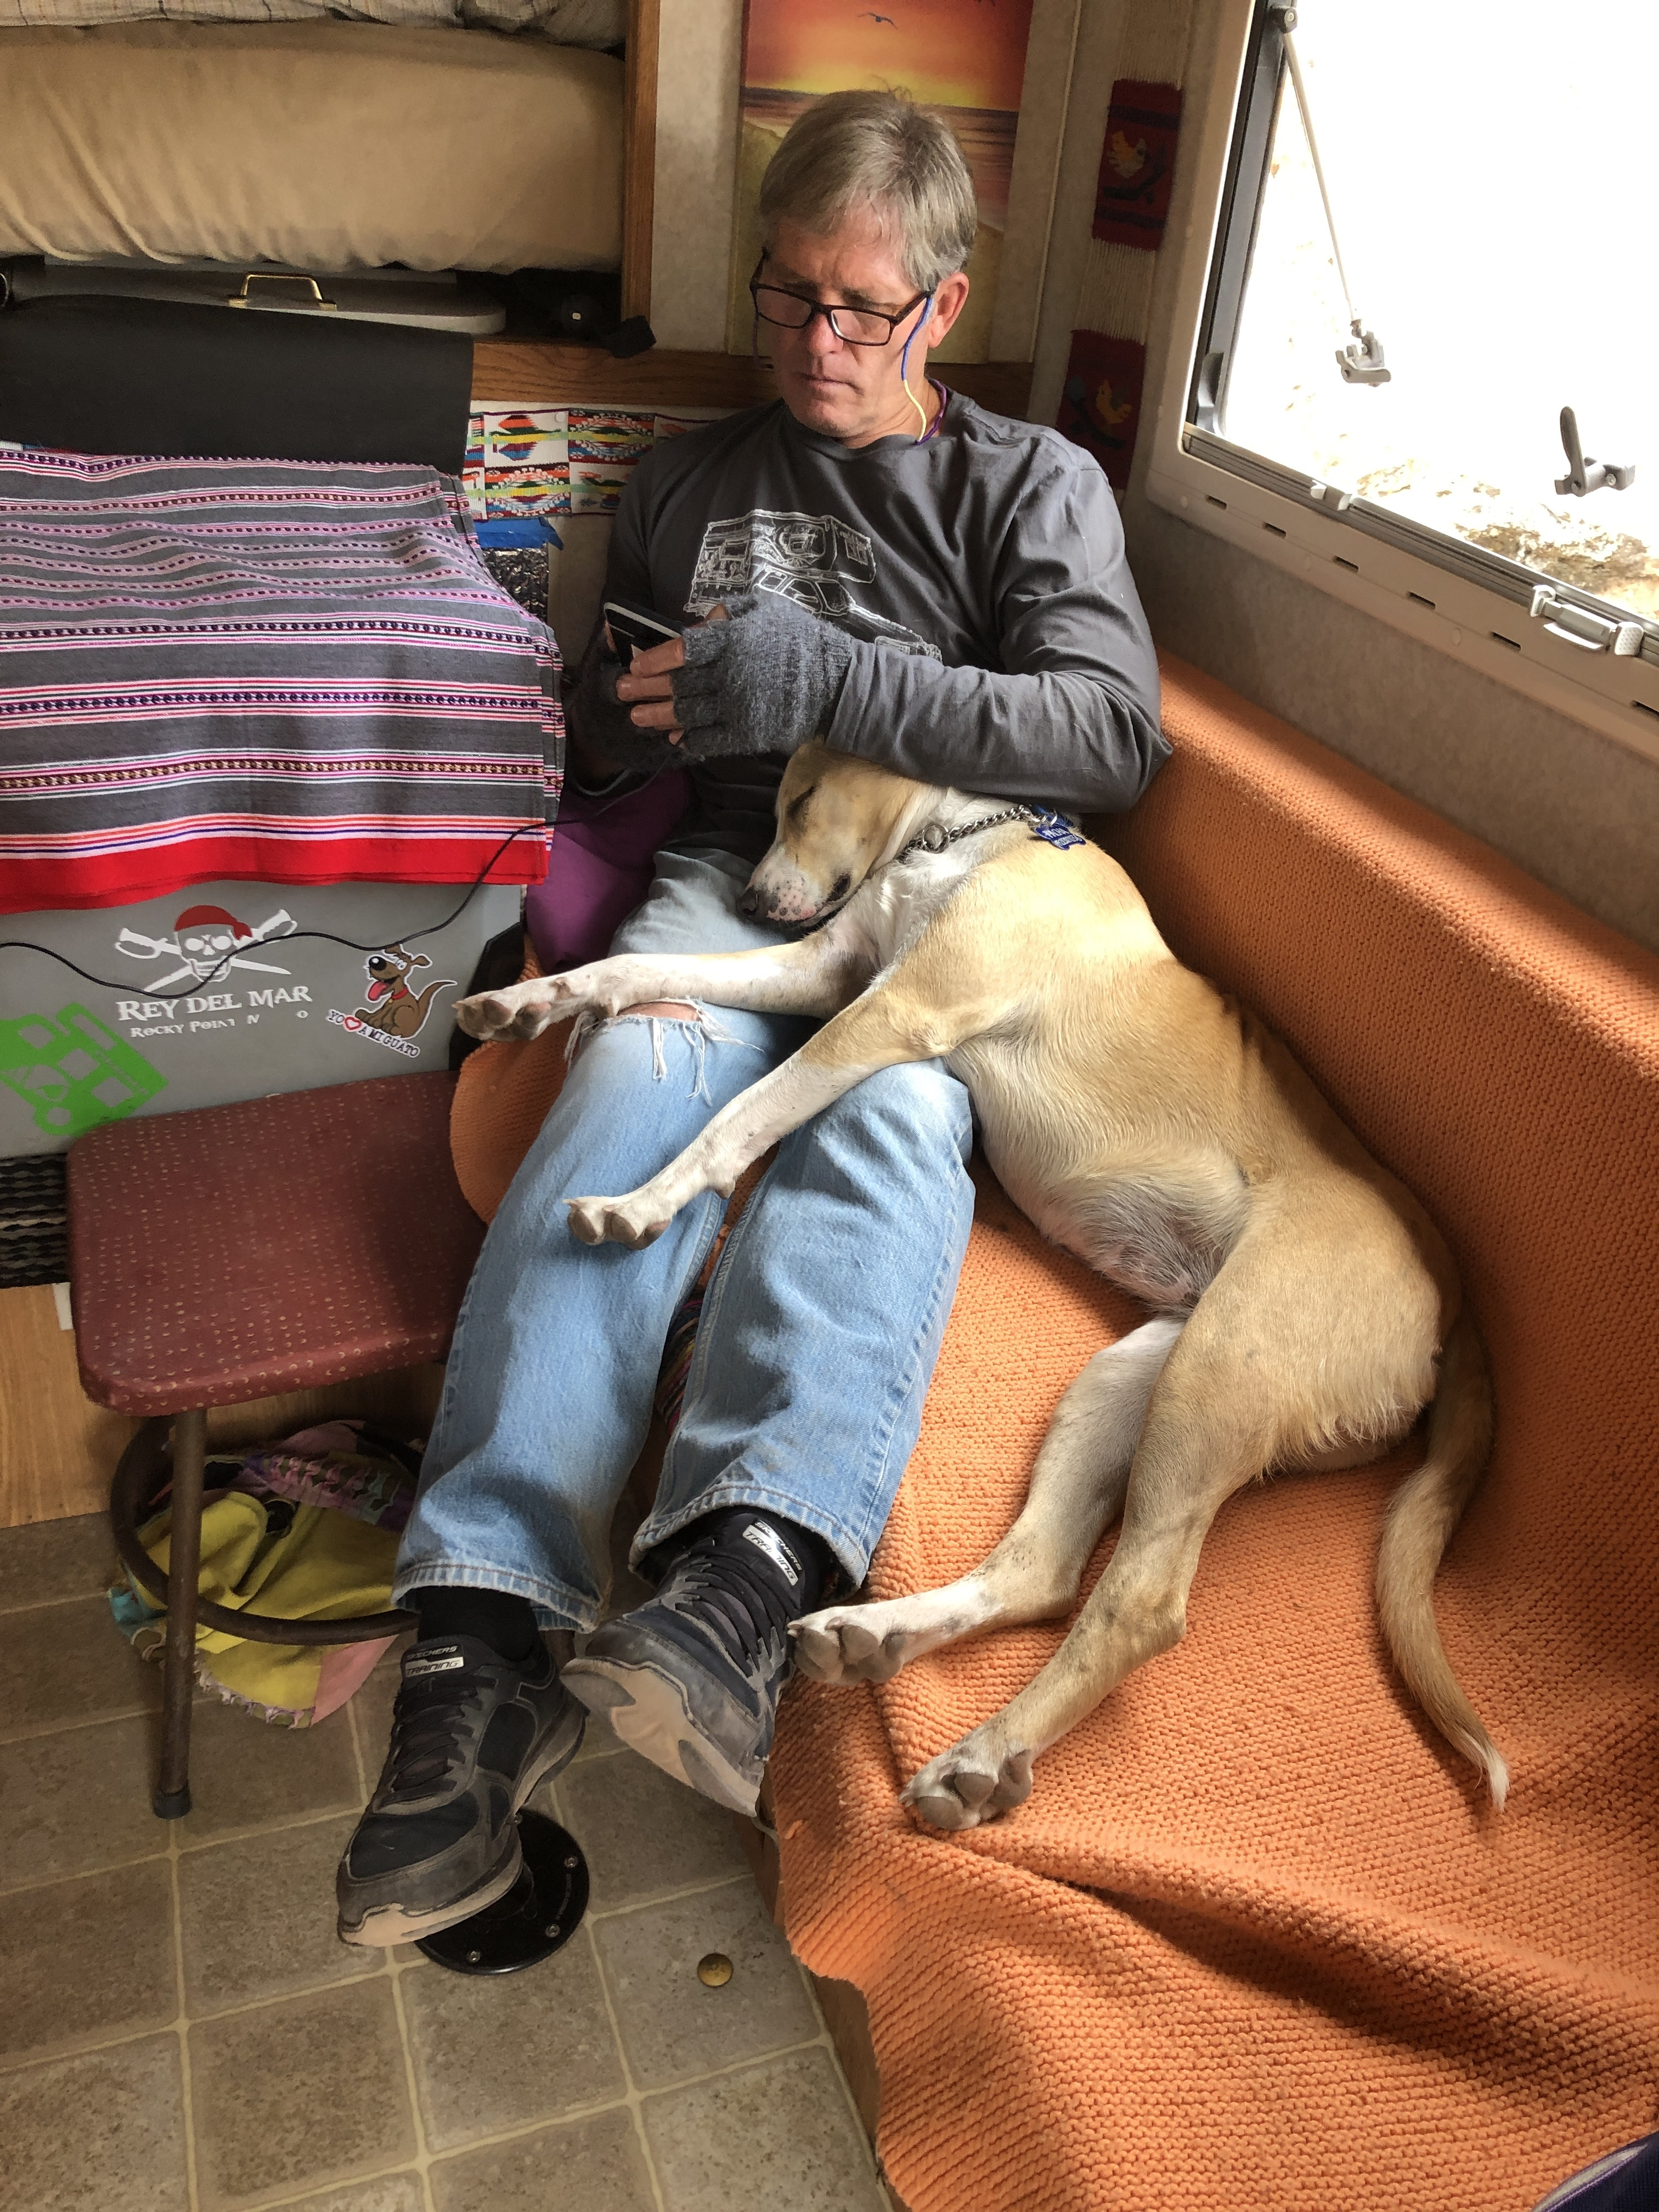 pacha cuddling